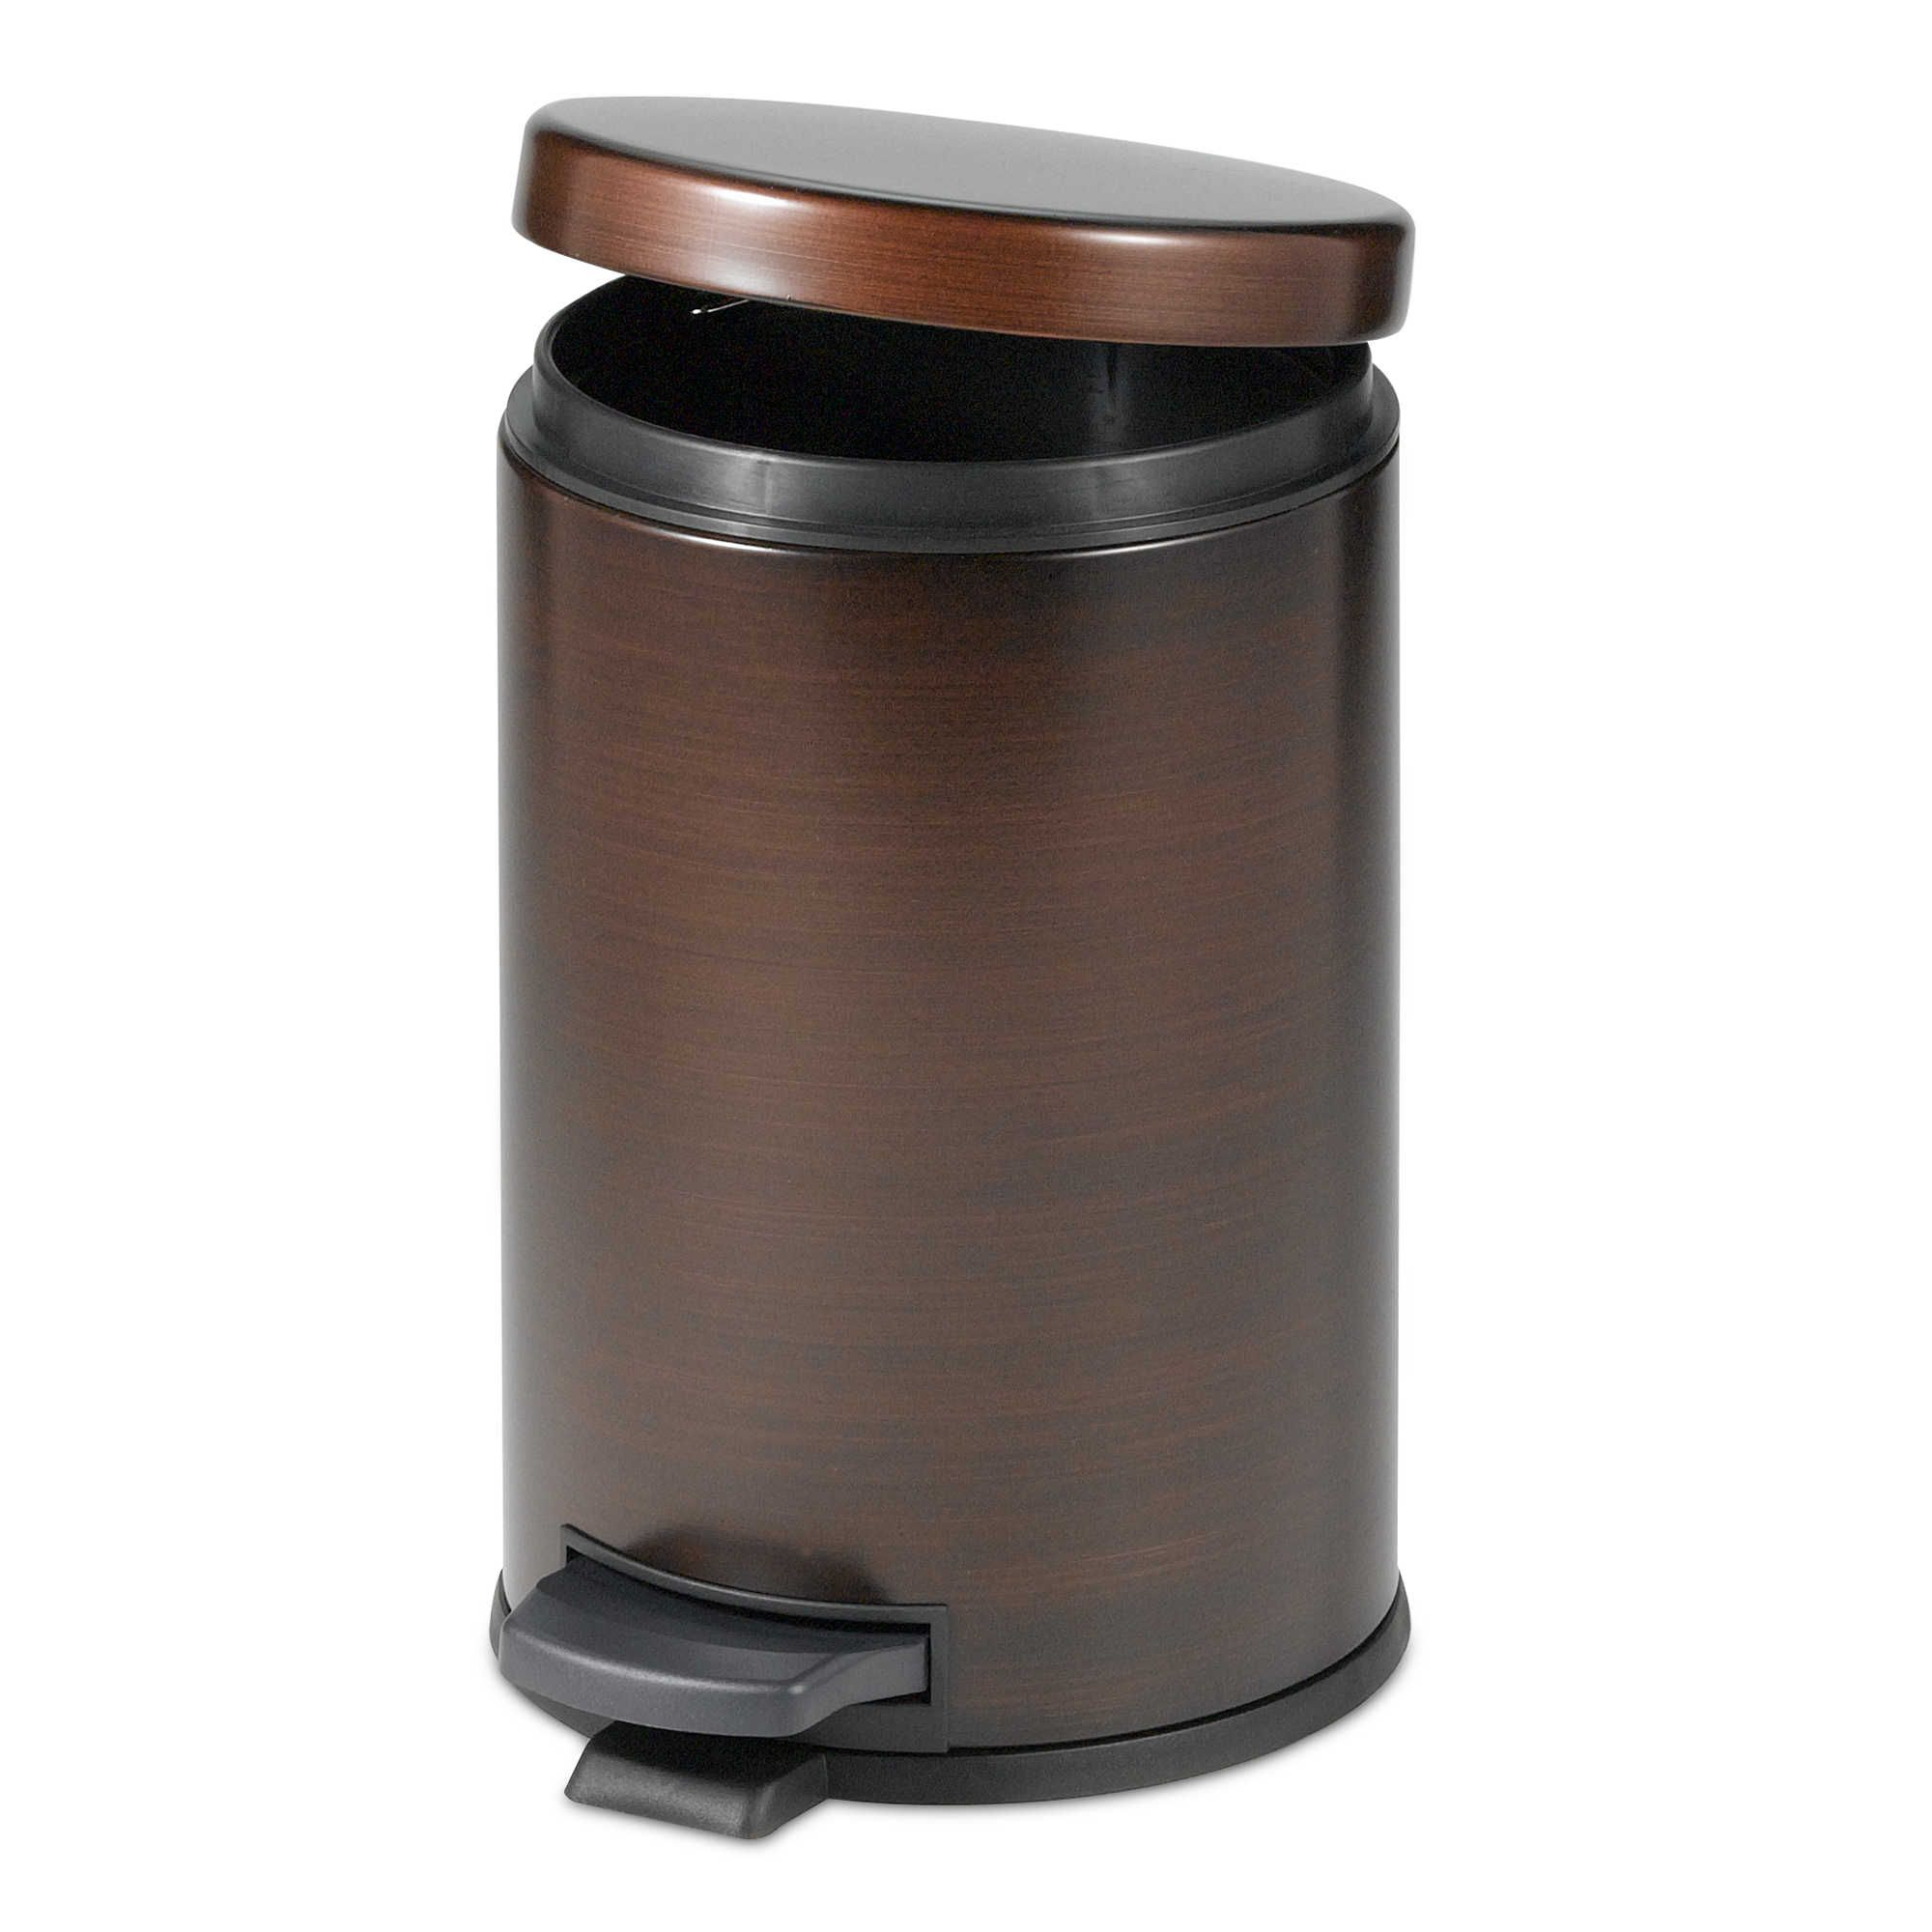 India Ink Oil Rubbed 4 1 2 Liter Bath Step On Wastebasket In